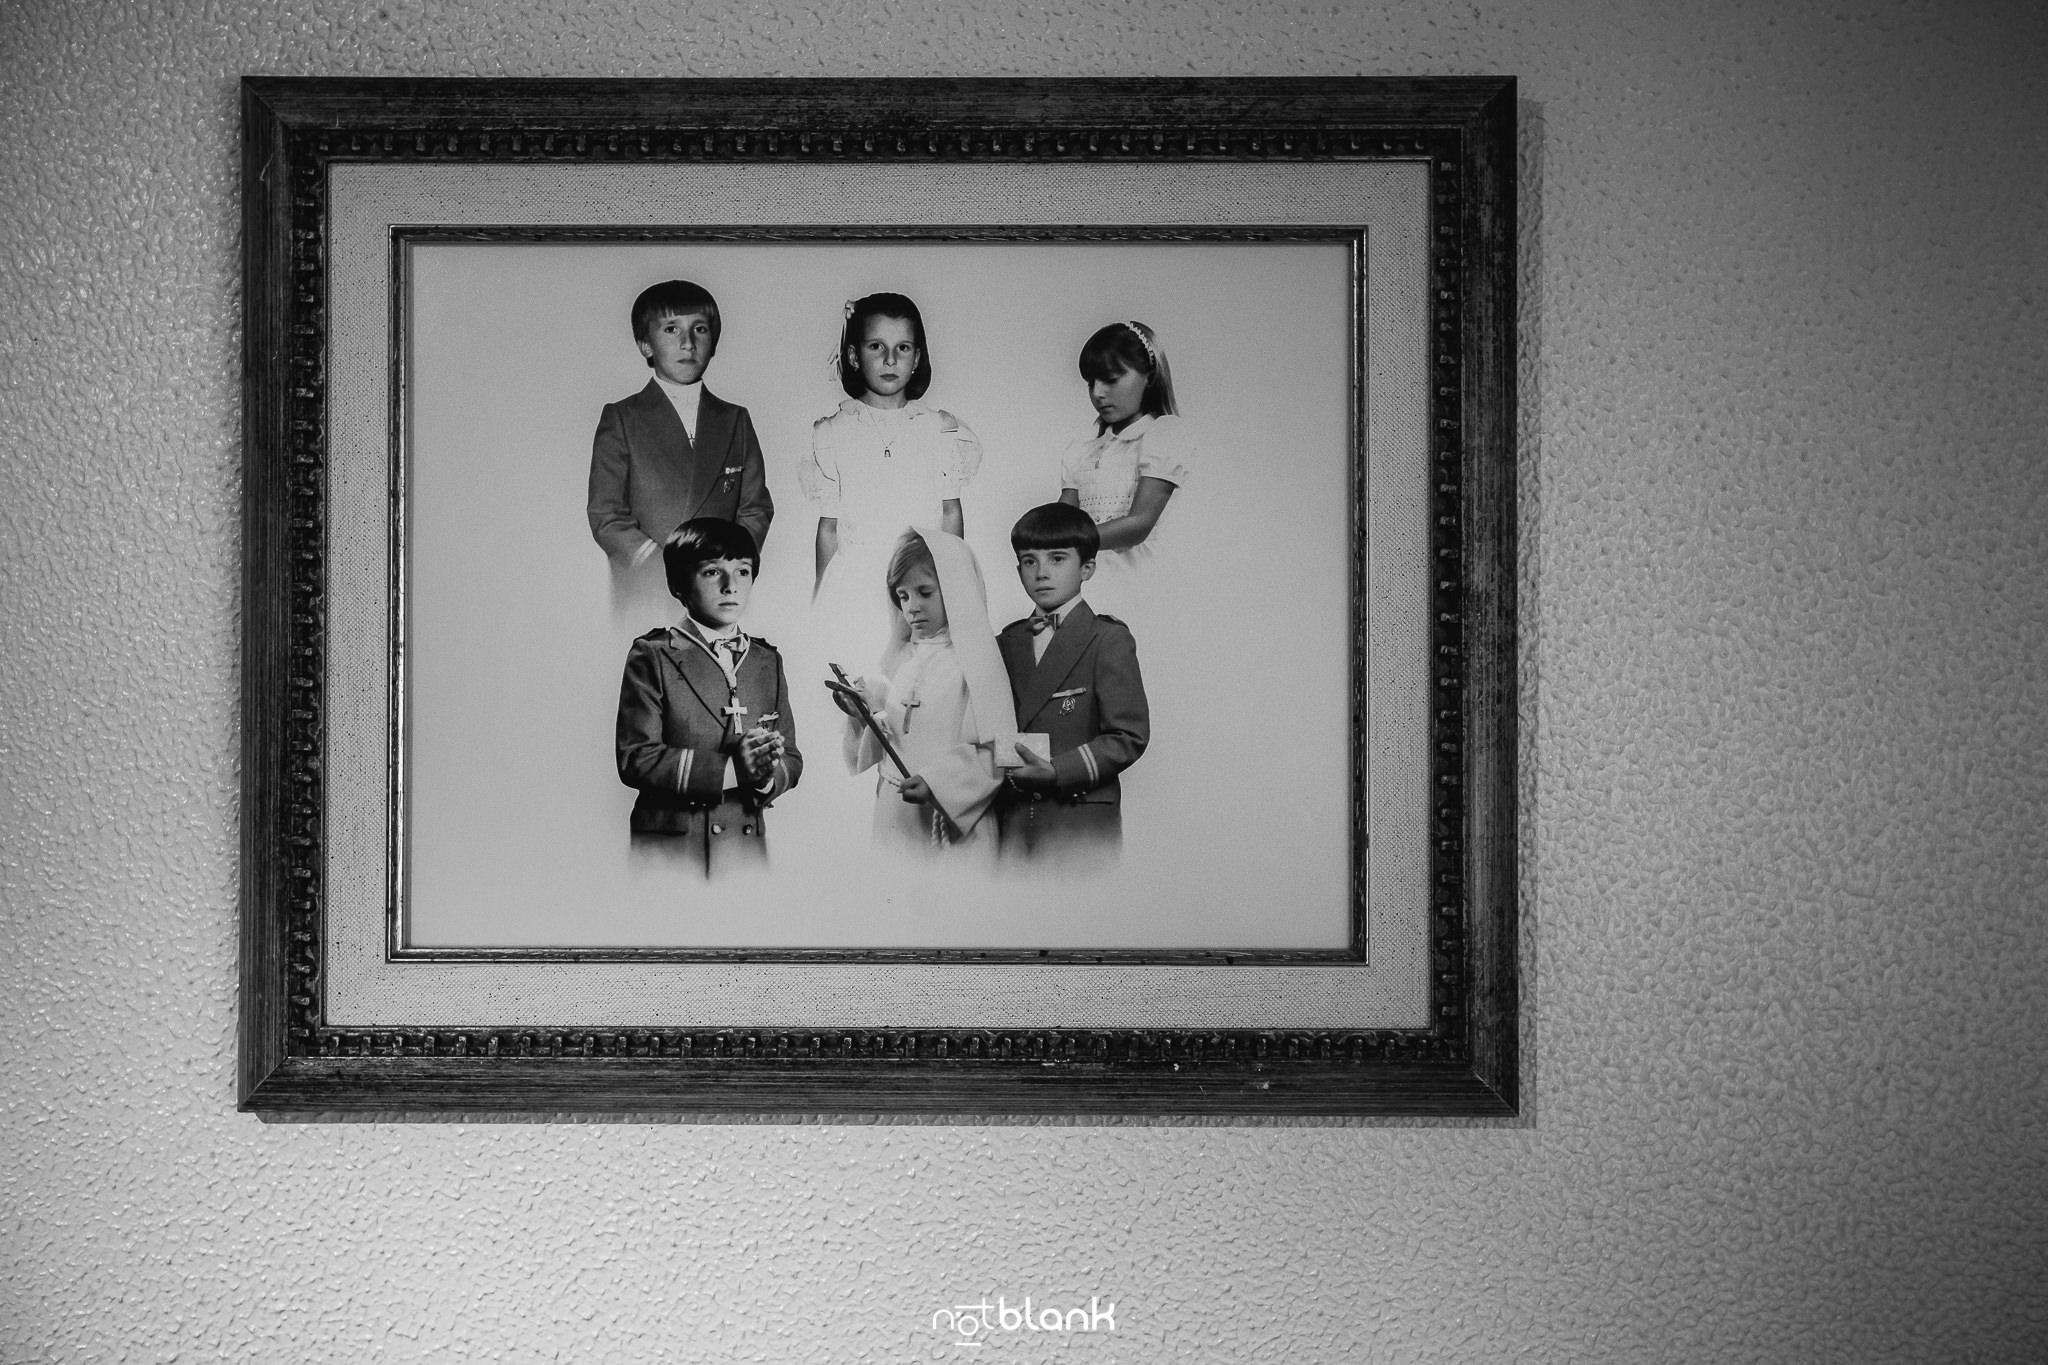 Boda-Maite-David-Foto-Comunion-Hermanos-En-Casa-Padres. Reportaje realizado por Notblank Fotografos de boda